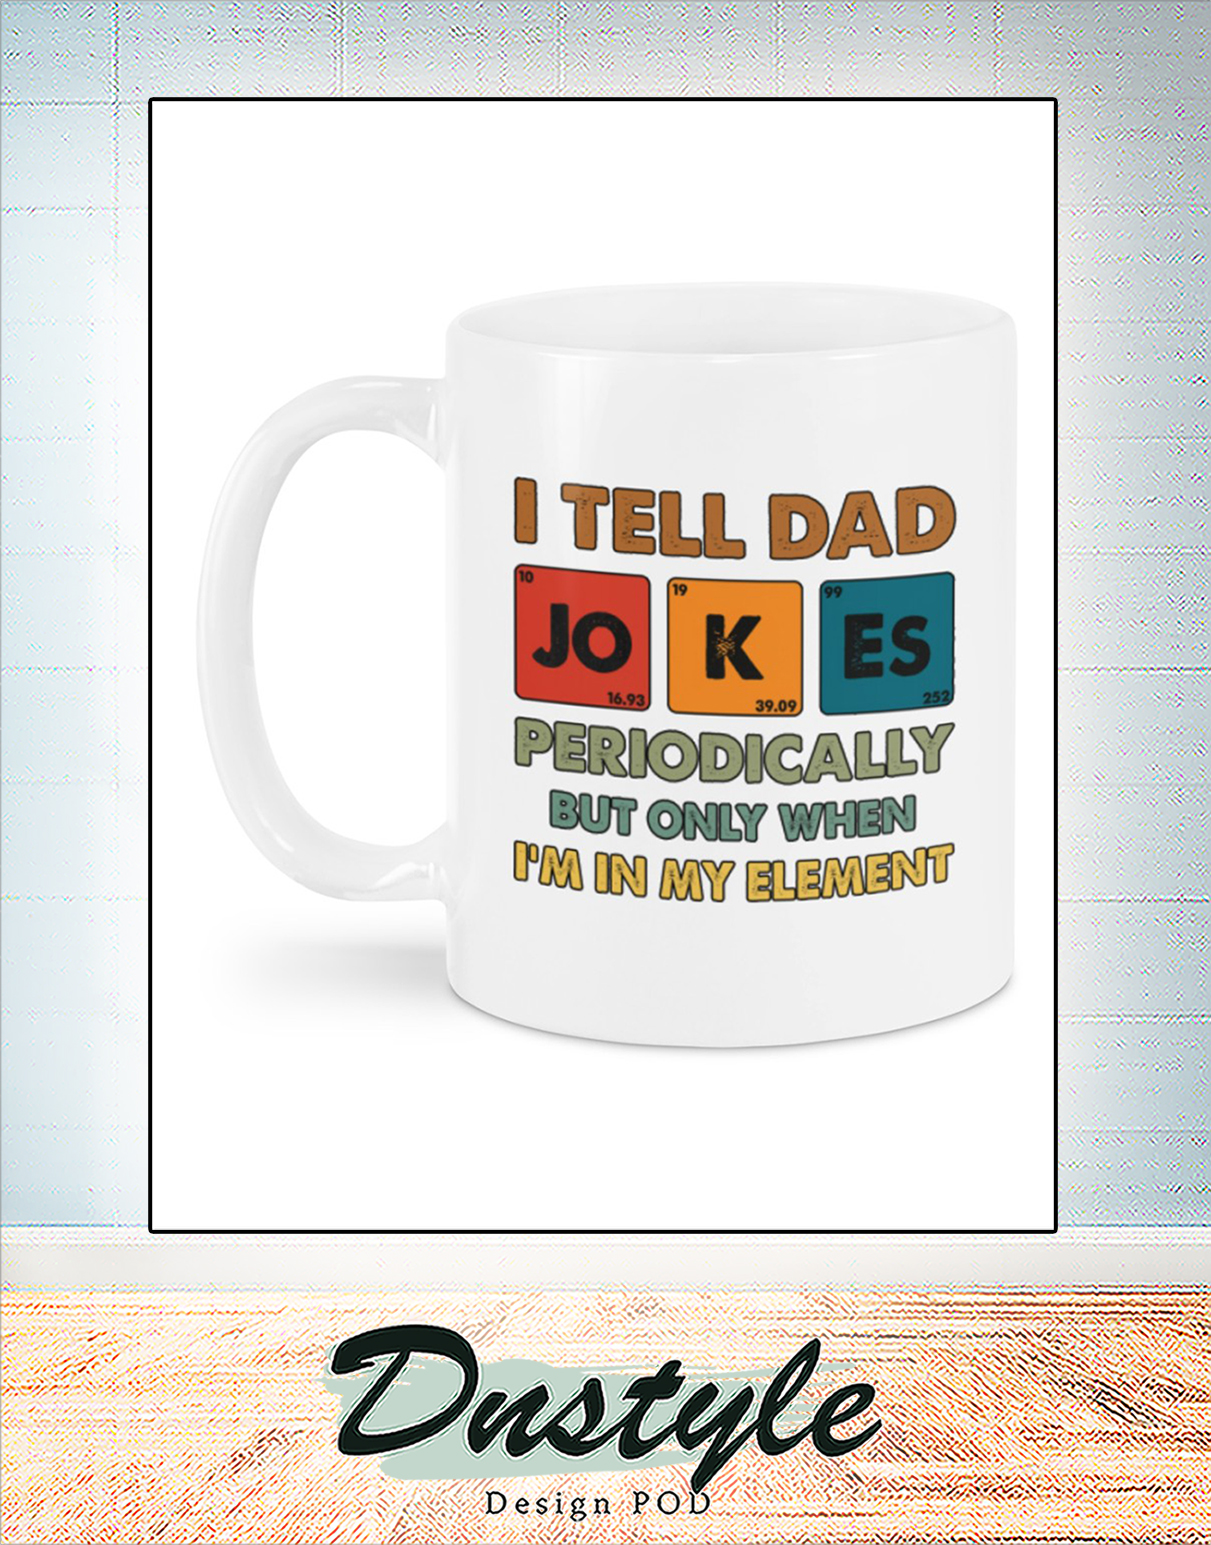 I tell dad jokes periodically mug 1